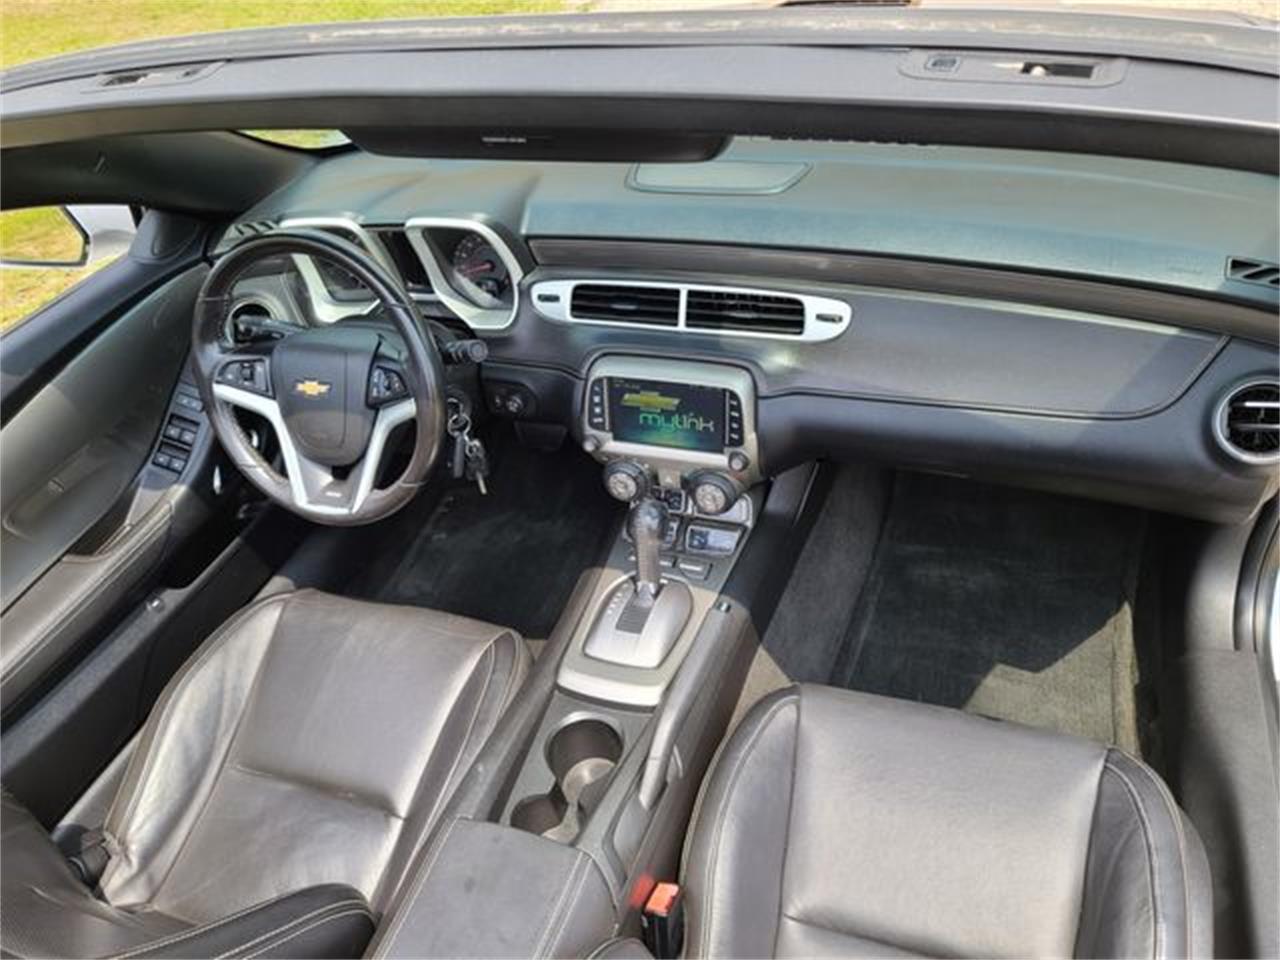 2015 Chevrolet Camaro (CC-1366140) for sale in Hope Mills, North Carolina